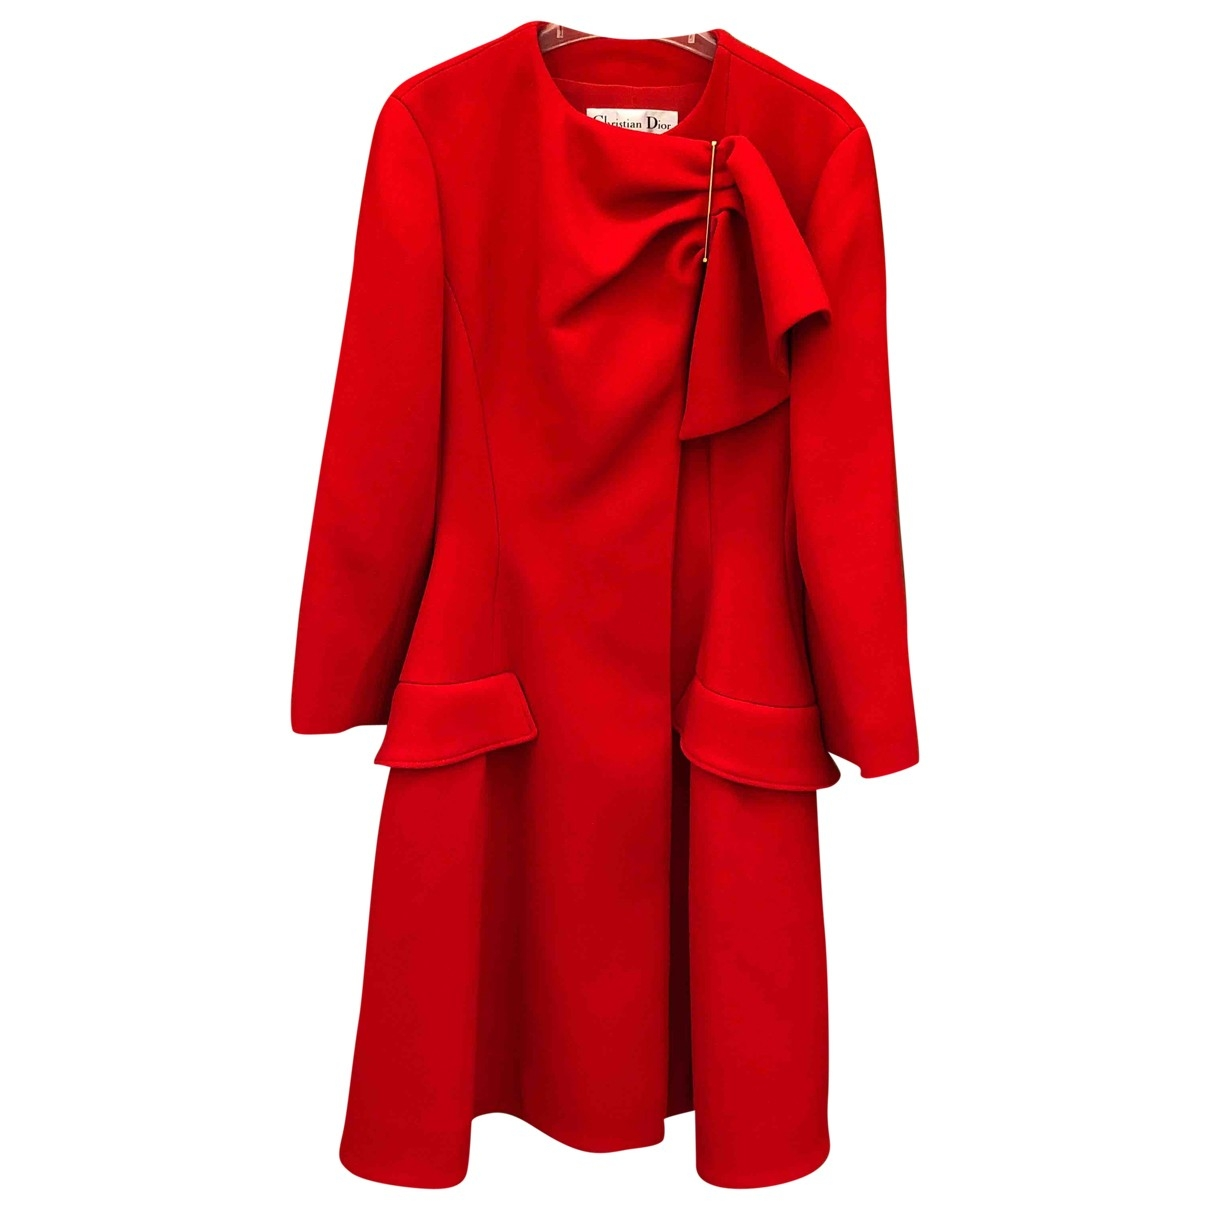 Dior \N Red Wool coat for Women 36 FR